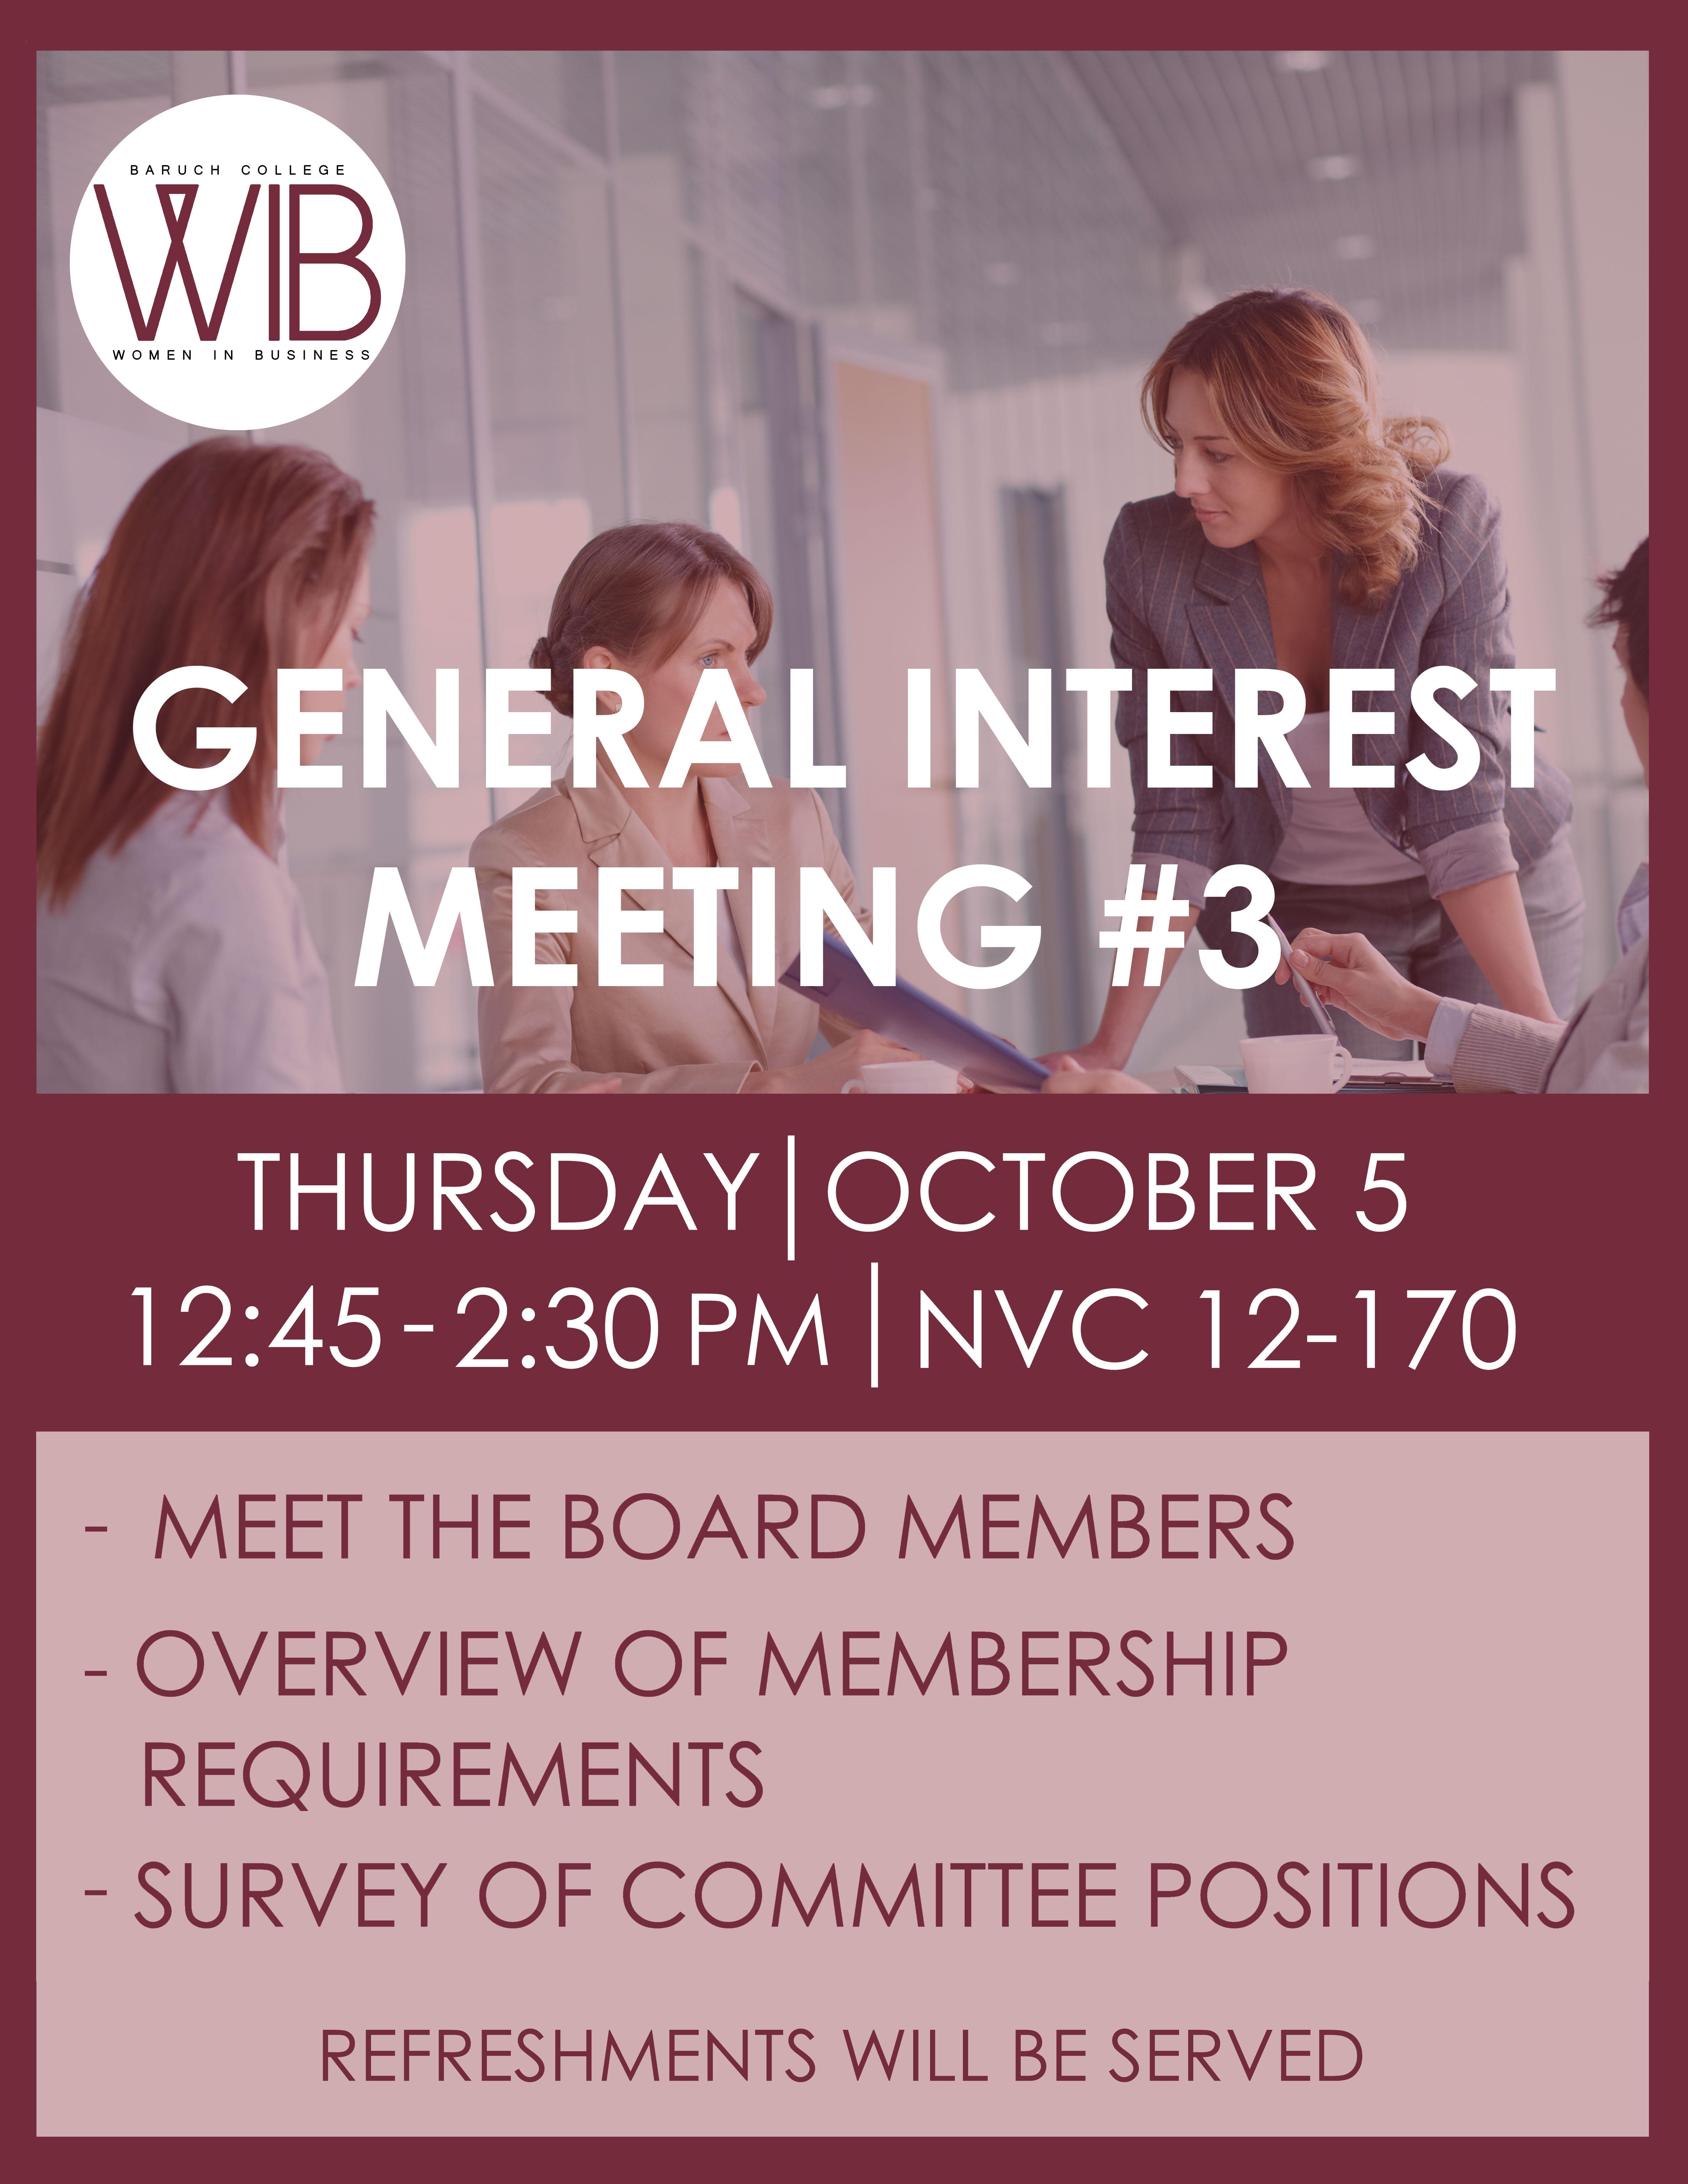 General Interest Meeting #3